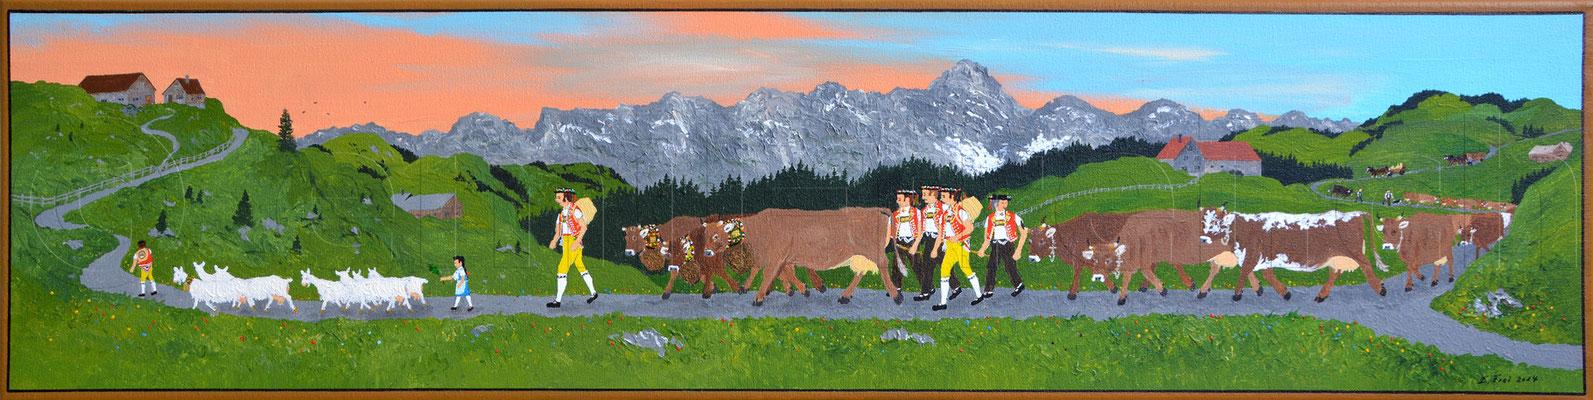 20 x 80 cm, Acryl auf Leinwand, 2015